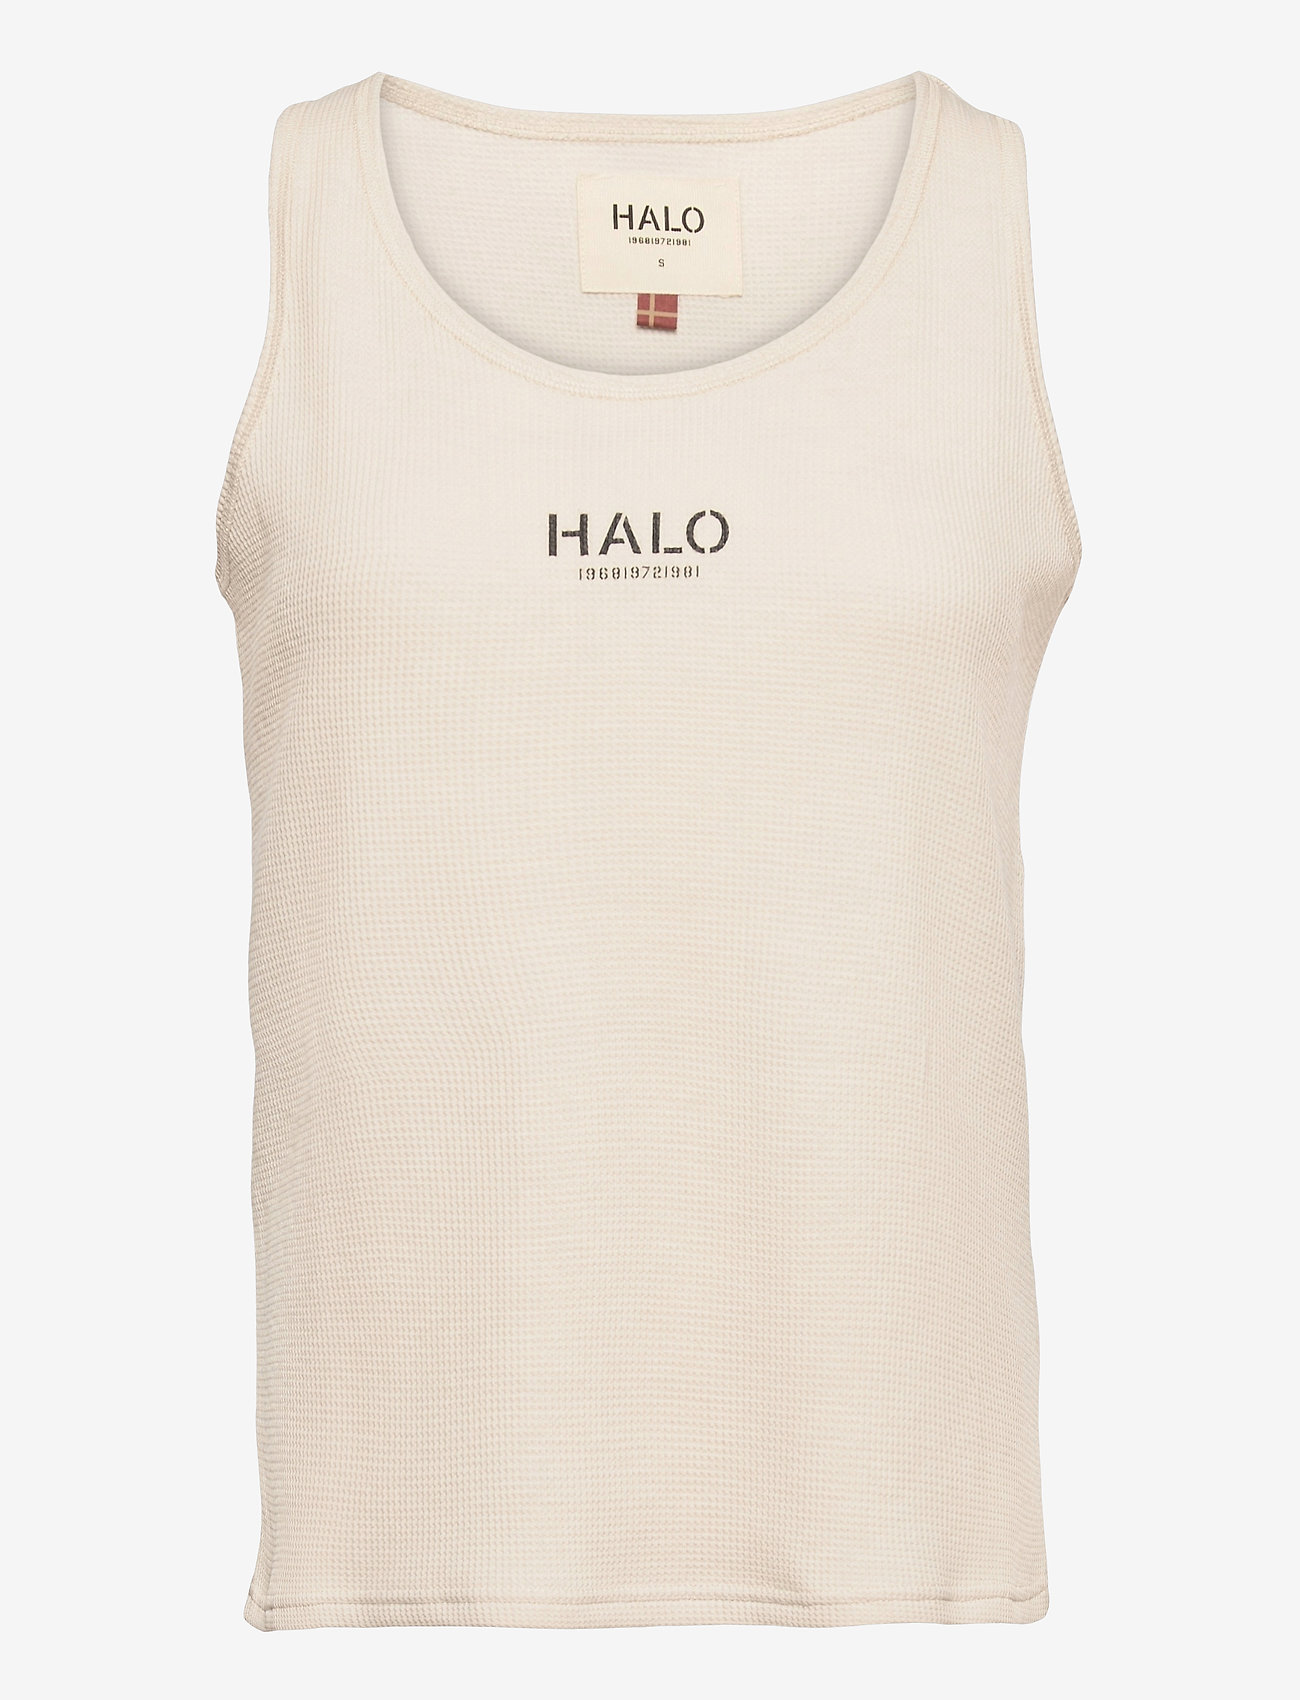 HALO - HALO WOMENS WAFFLE TANK - Ärmellose tops - pumice stone - 0